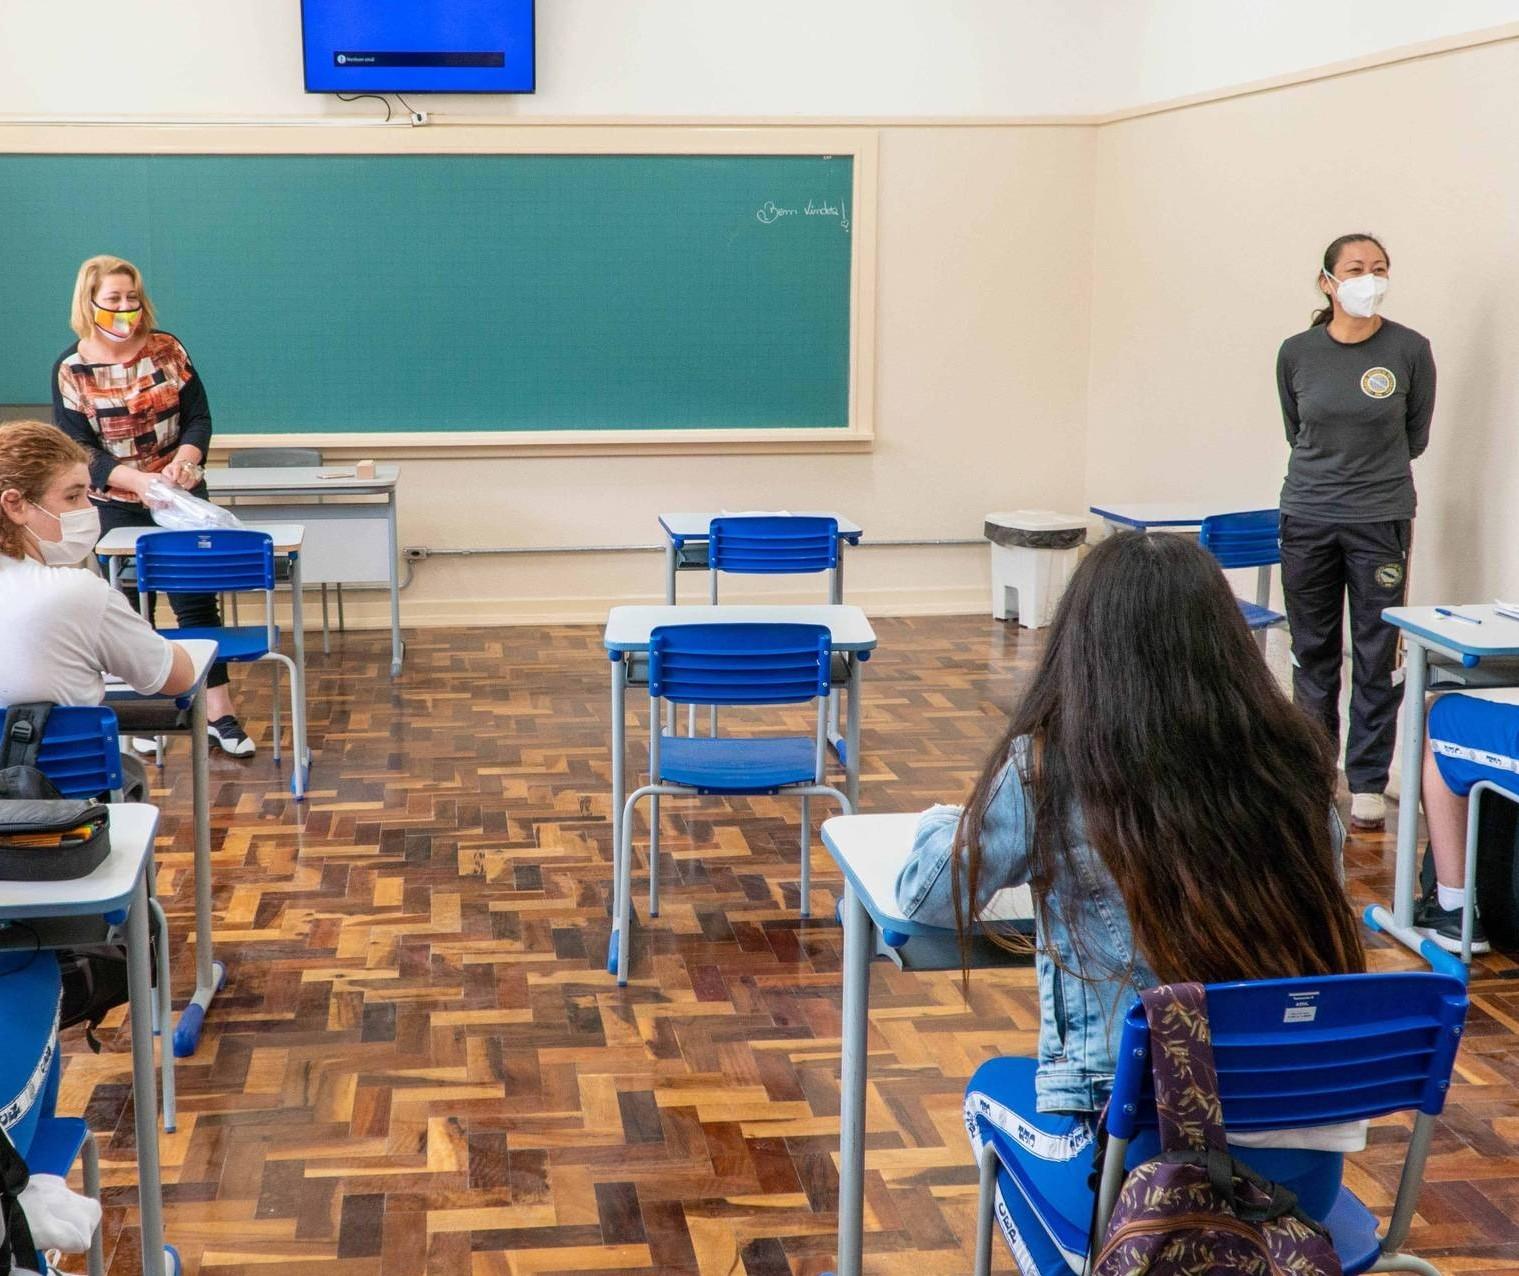 Rede estadual deverá retornar integralmente ao ensino presencial